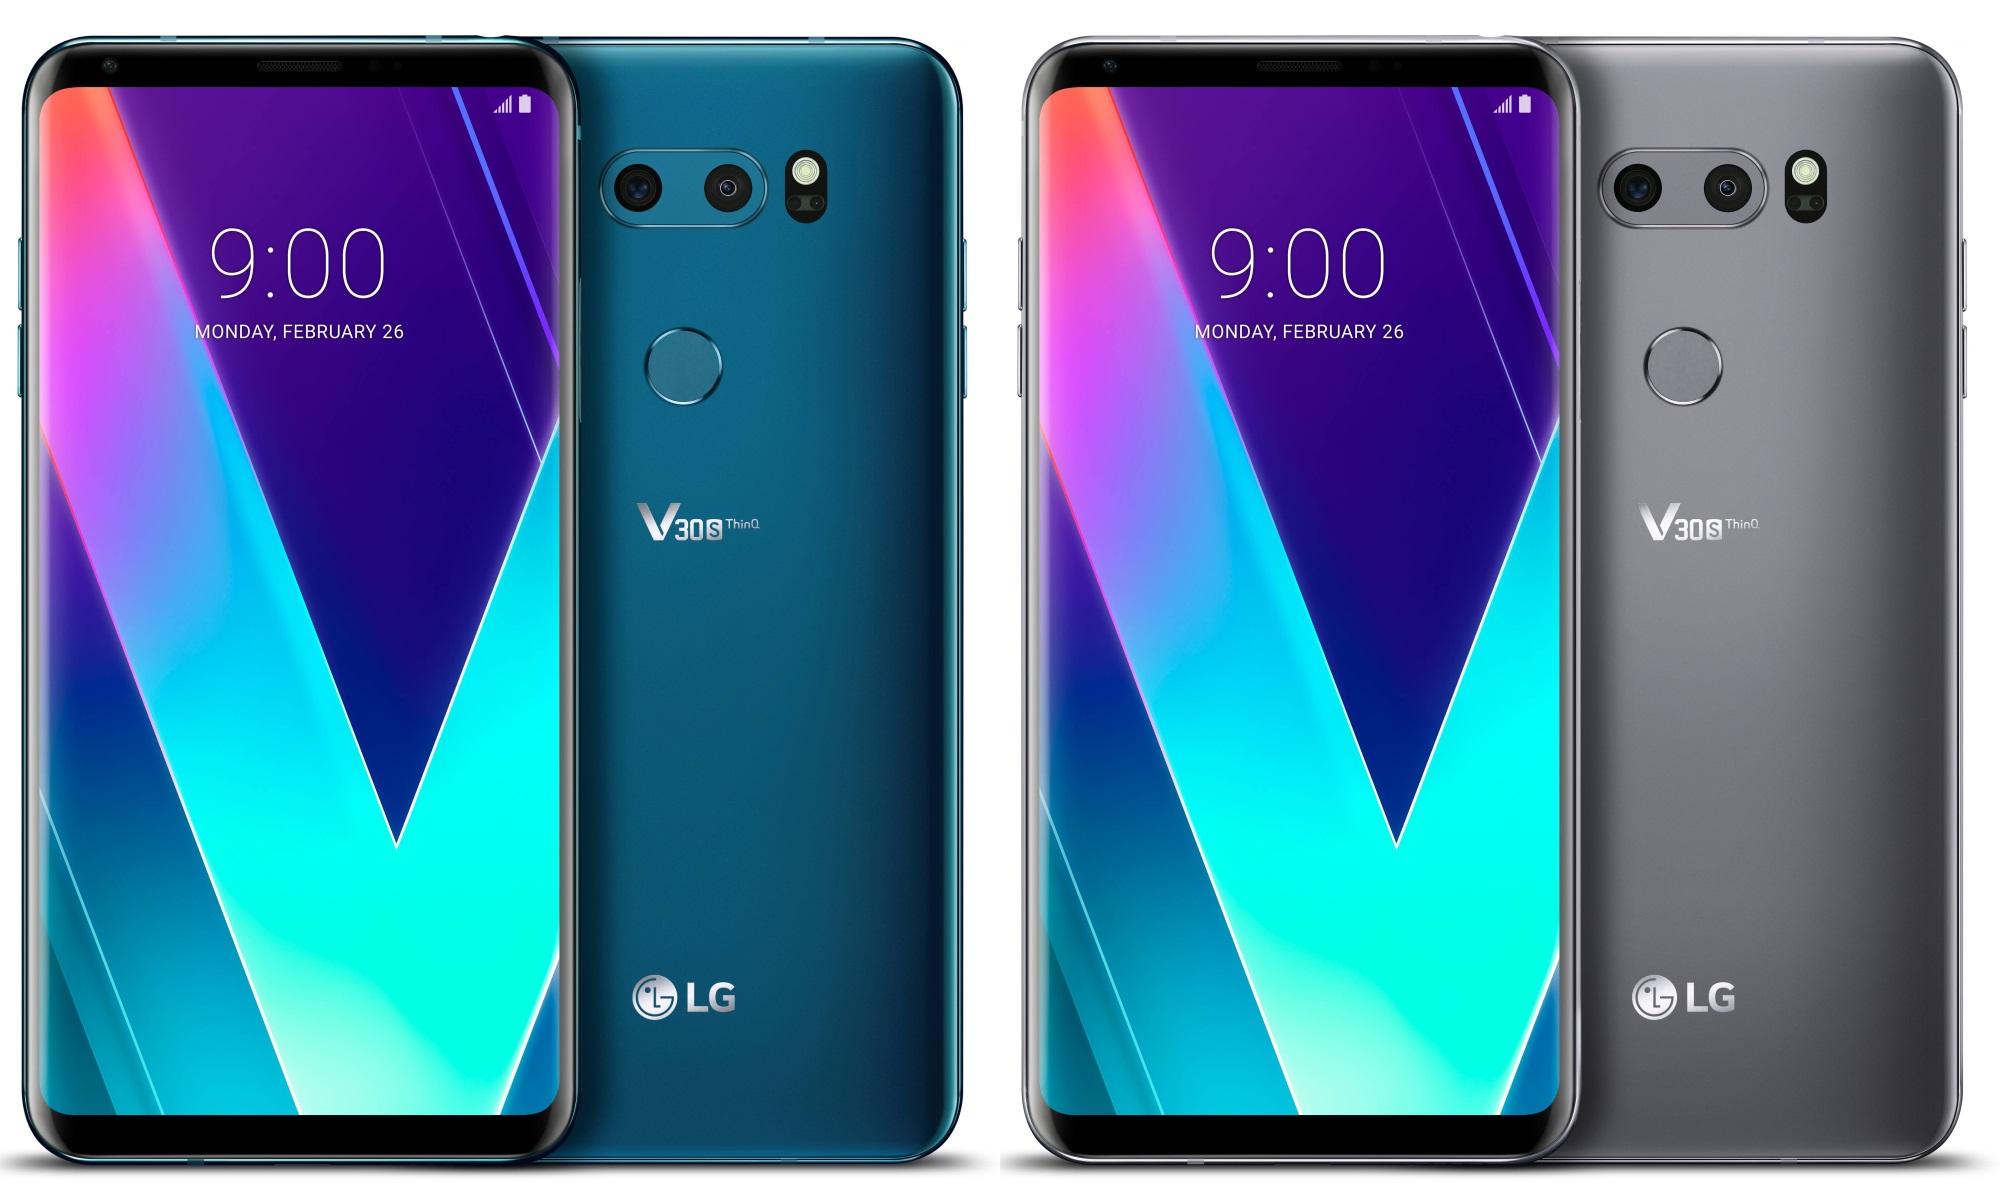 lg v30s thinq - 5 Smartphone LG dengan Layar Bezel-less Desain Lebih Mewah